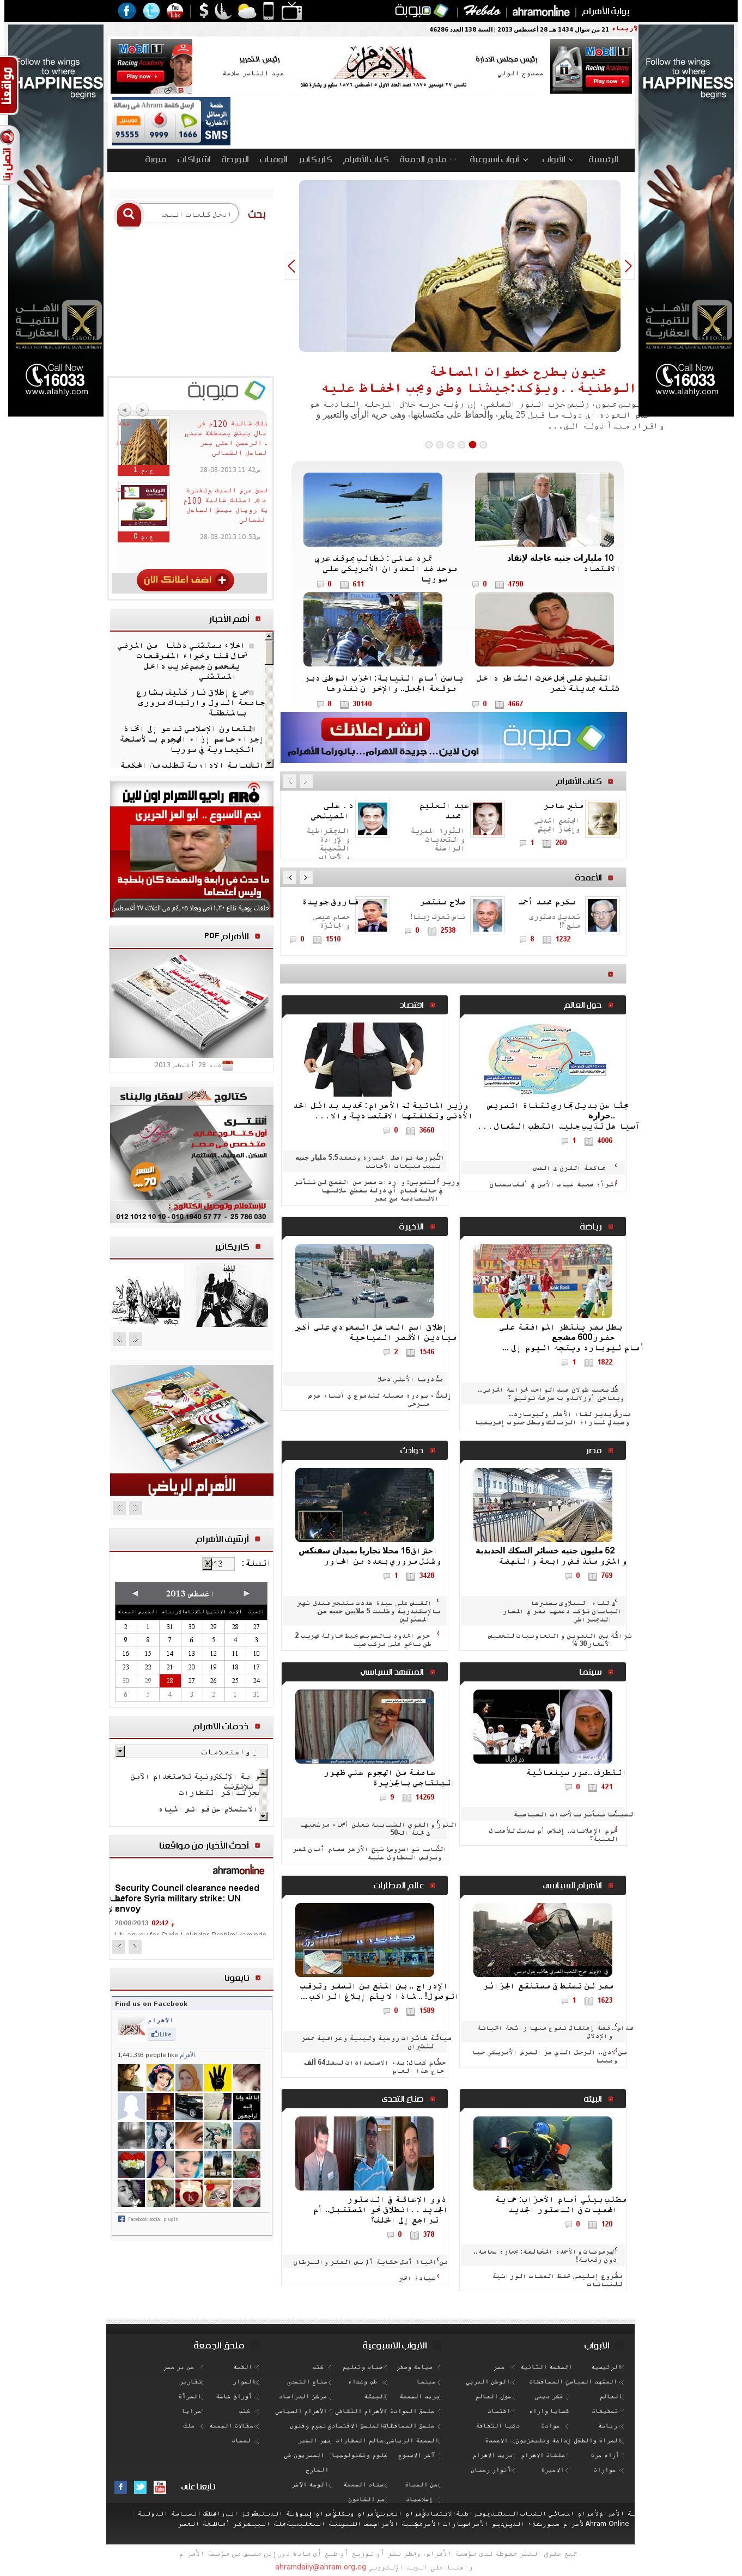 Al-Ahram at Wednesday Aug. 28, 2013, 5 p.m. UTC